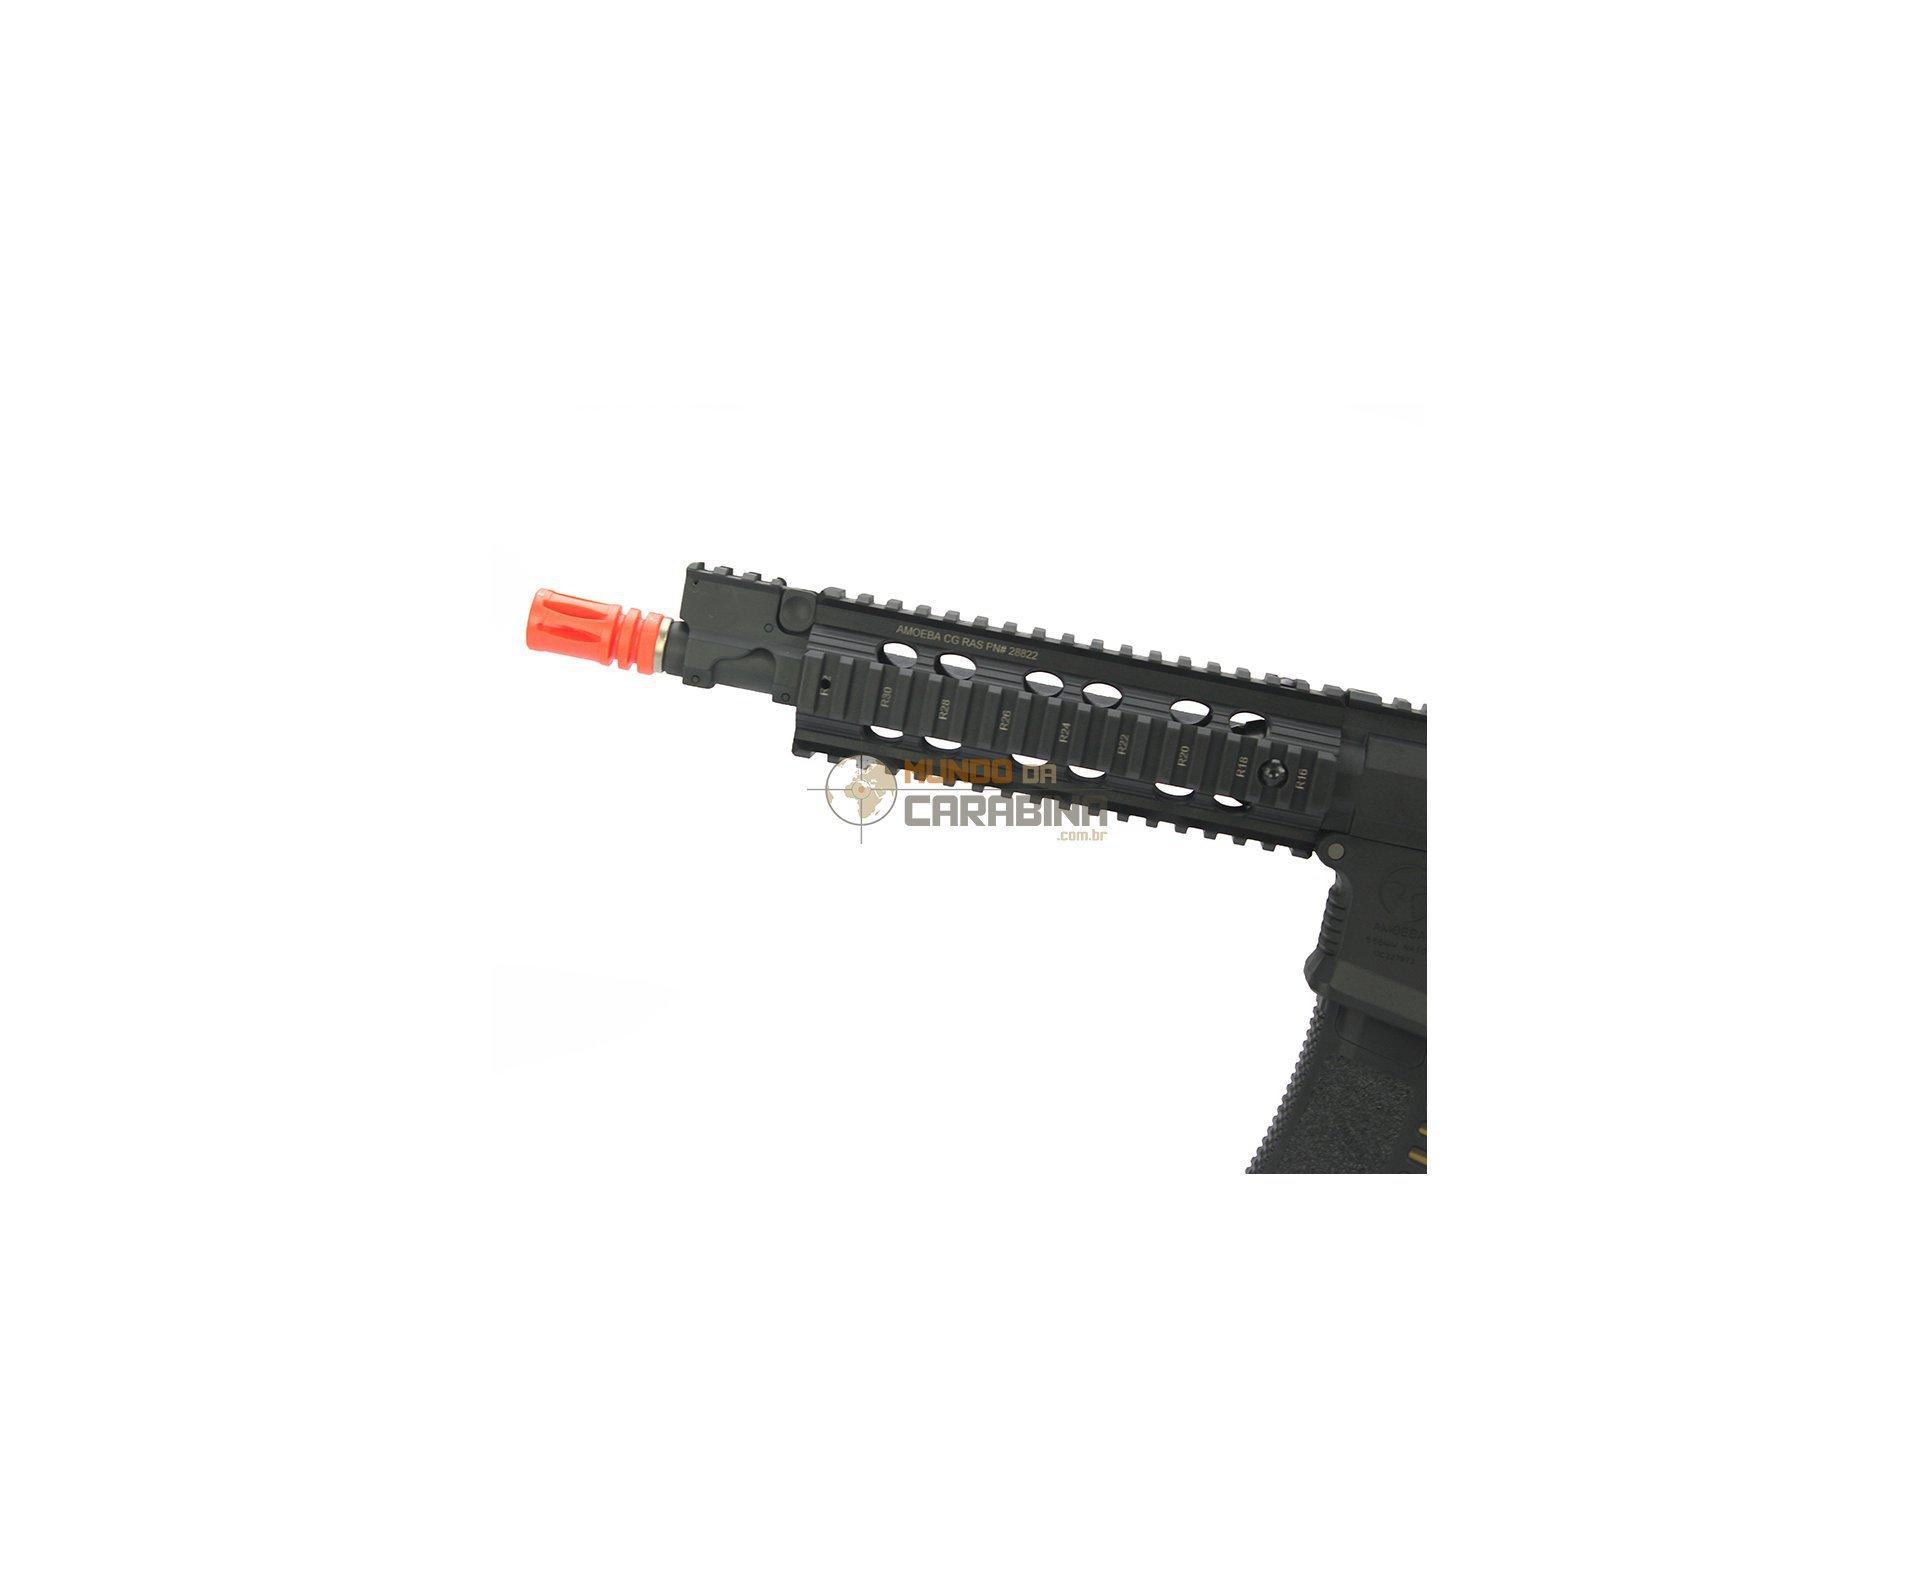 Rifle De Airsoft M4 Cqb Ris Amoeba Am-008-bk - Cal 6.0mm - Ares